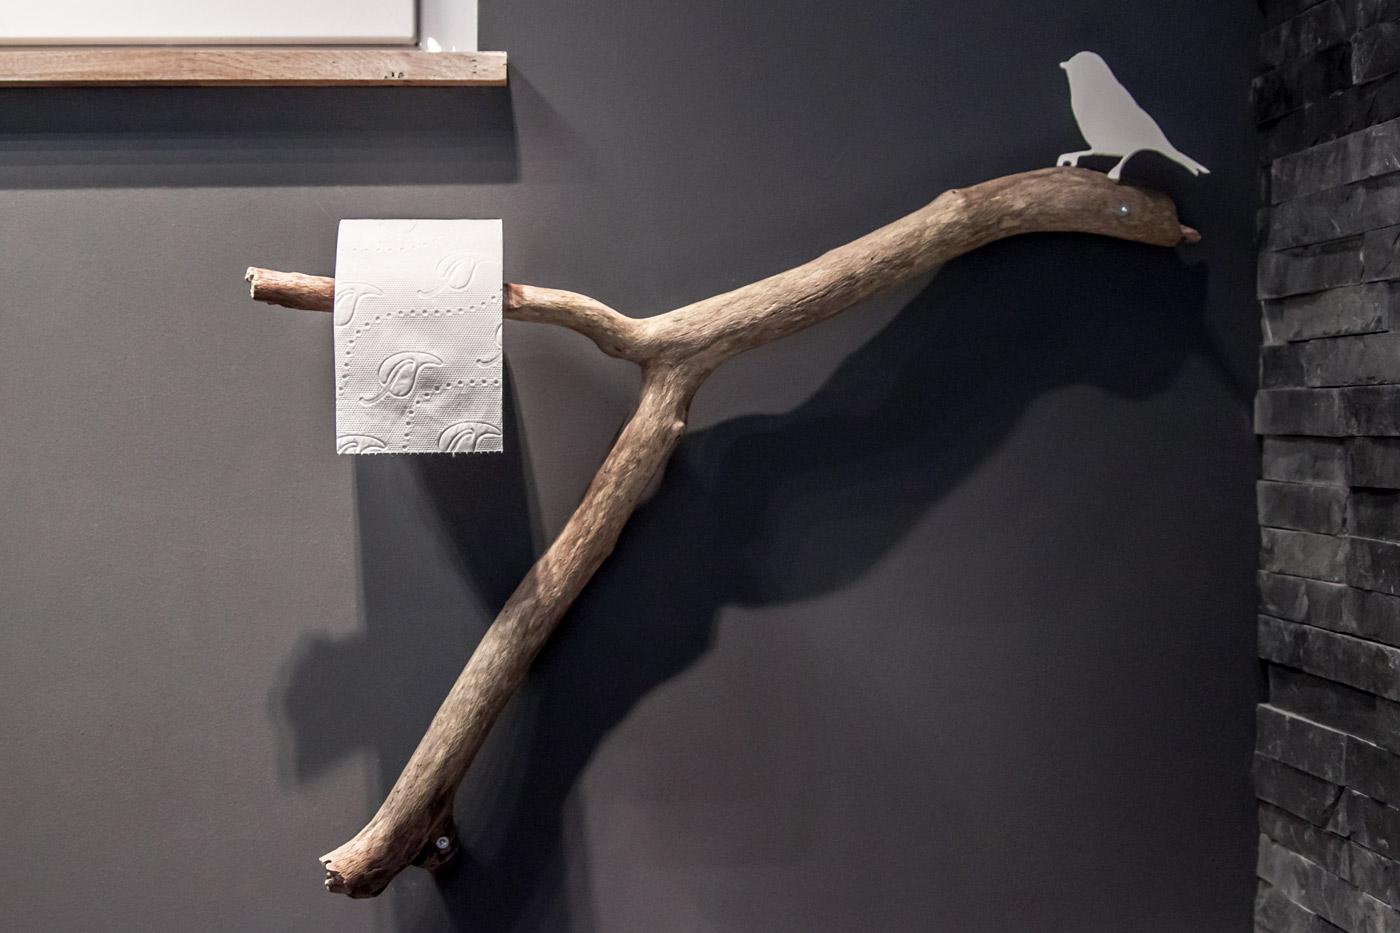 WC Rollenhalter DIY Idee